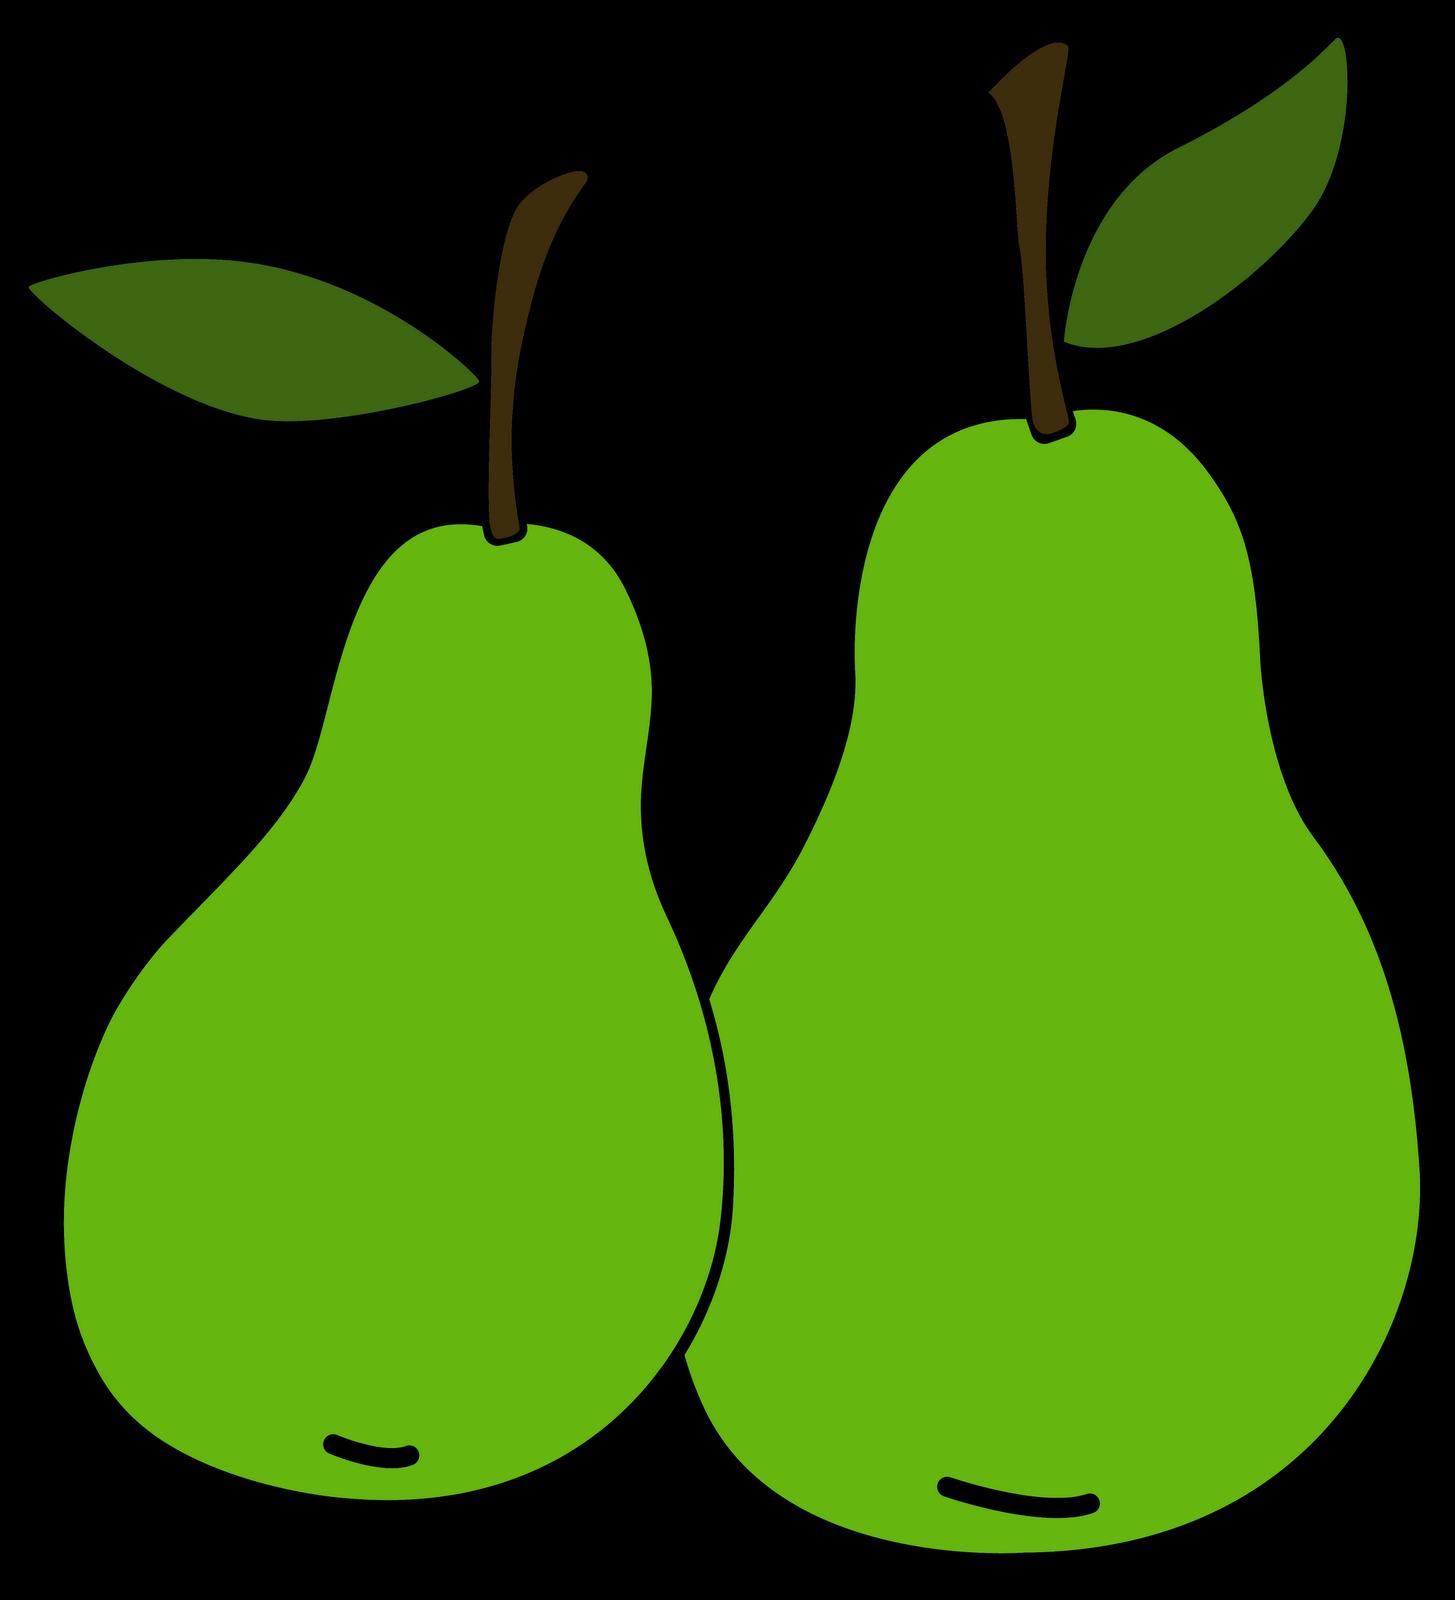 Pear clipart green pear. Diaper cake food fruit